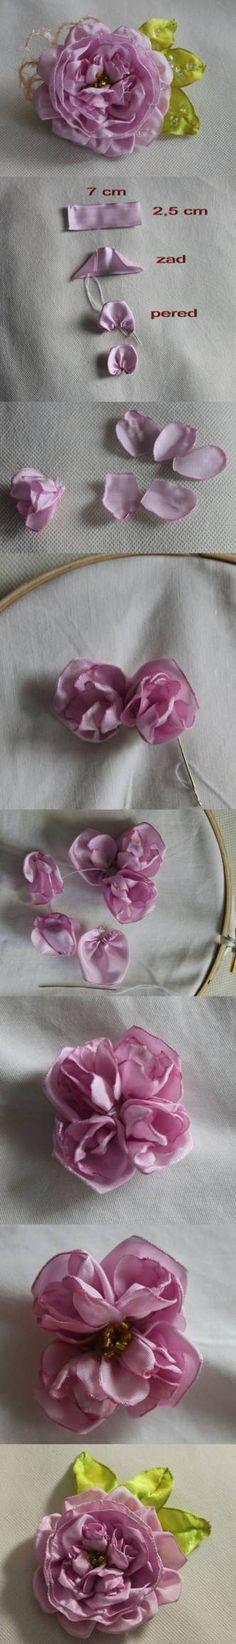 DIY English Rose Brooch Tutorial DIY English Rose Brooch Tutorial by diyforever Ribbon Art, Diy Ribbon, Fabric Ribbon, Ribbon Crafts, Flower Crafts, Cloth Flowers, Fabric Roses, Lace Flowers, Fleurs Kanzashi